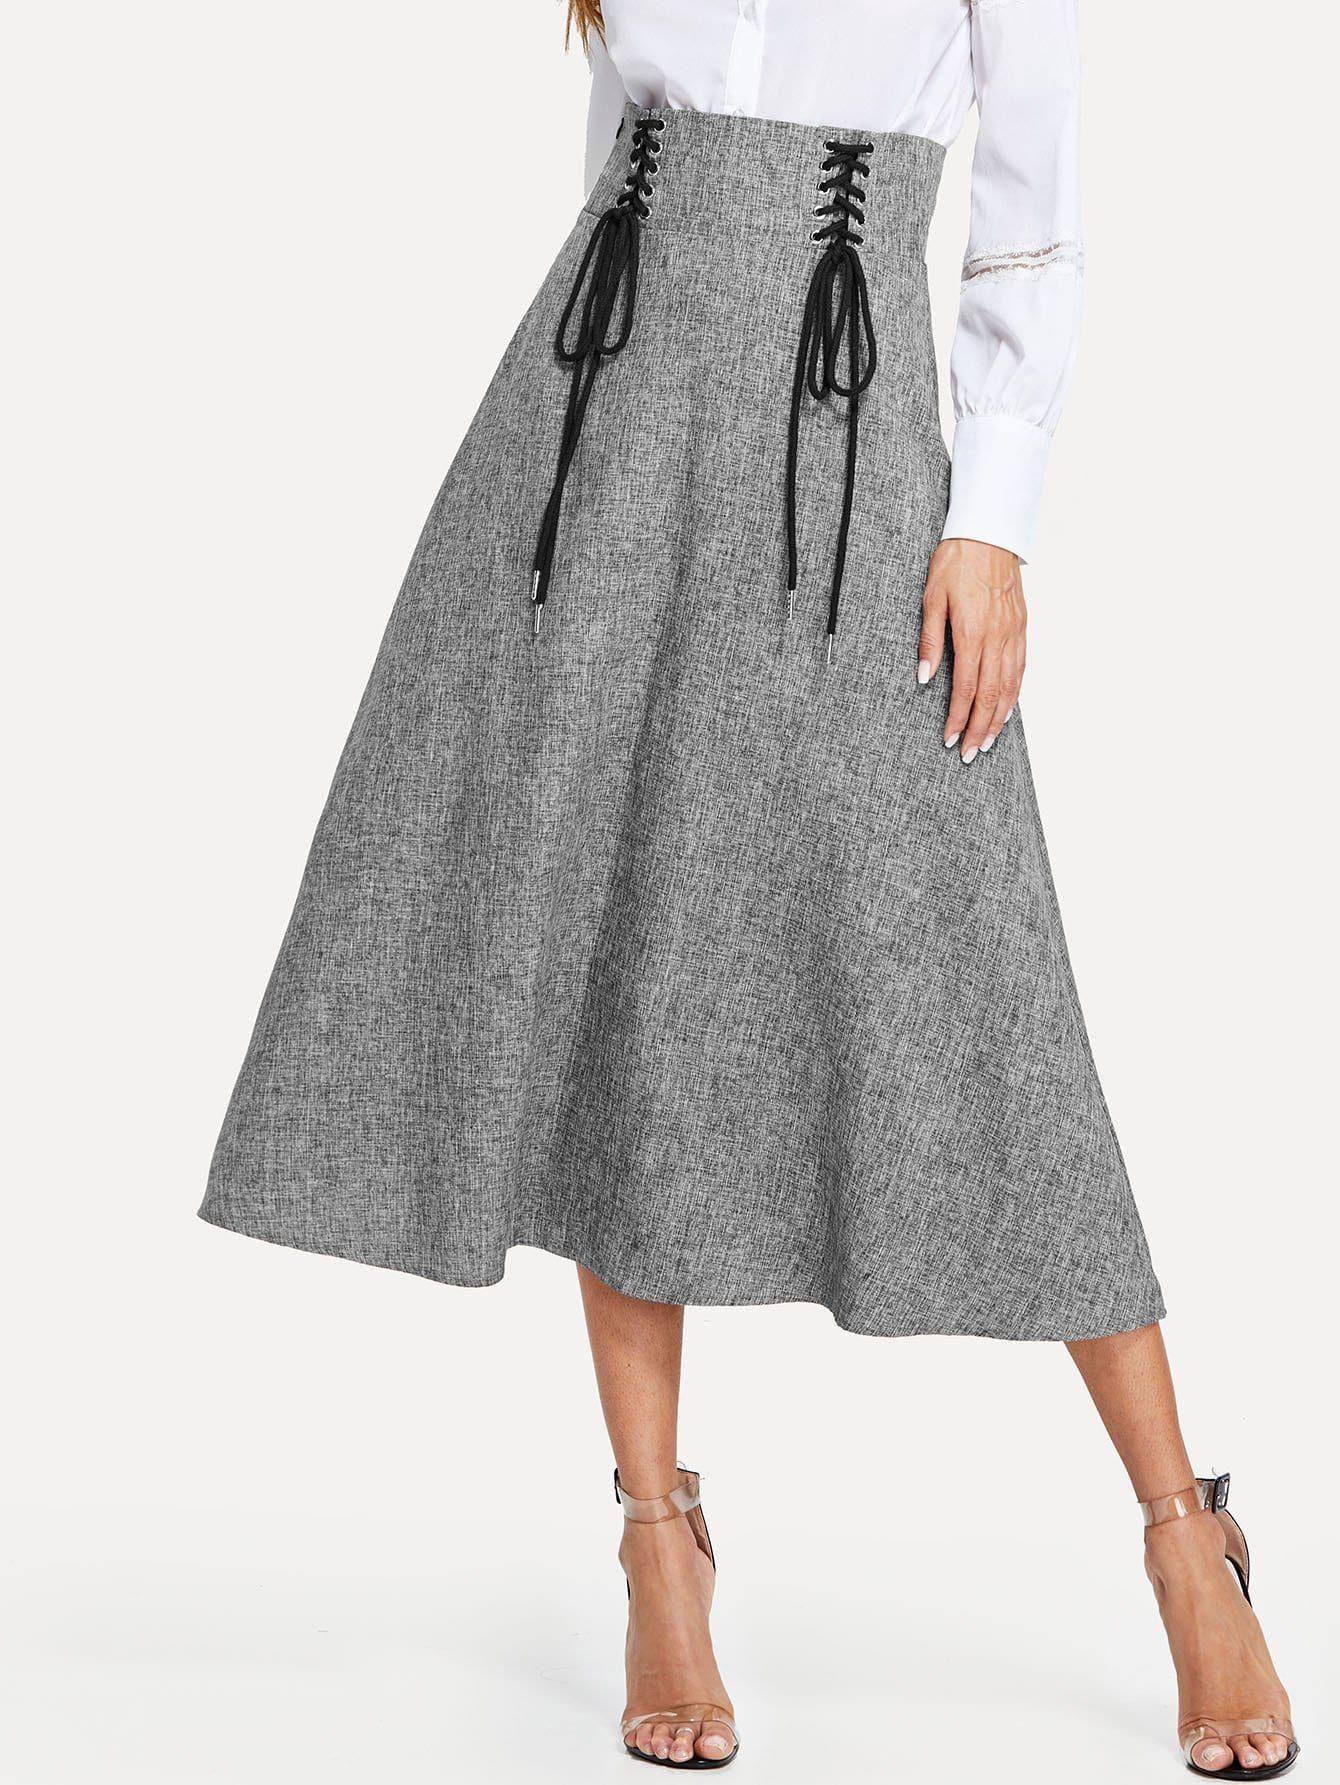 d4e84ca34 Women Elegant A Line Plain Shift High Waist Grey Long/Full Length Grommet  Lace-